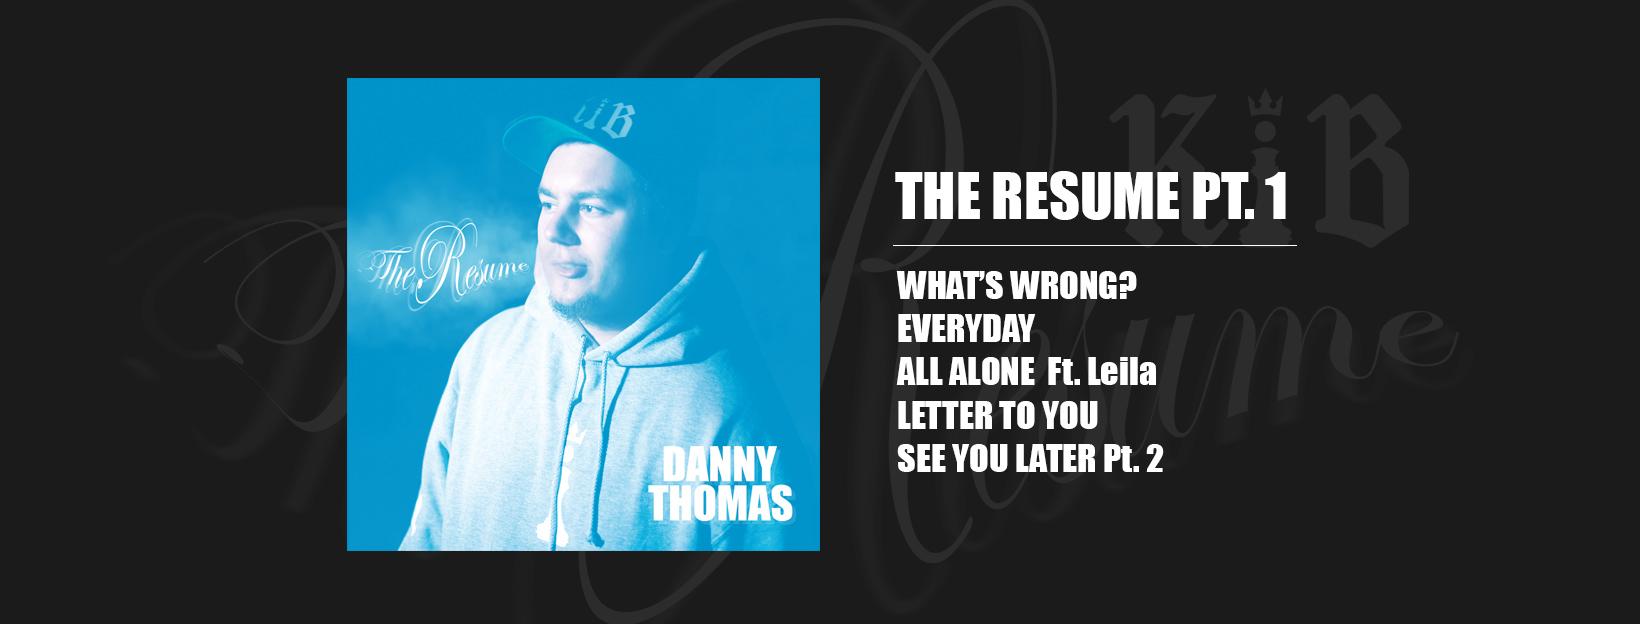 Danny-Thomas-The-Resume_part-1-fb.jpg